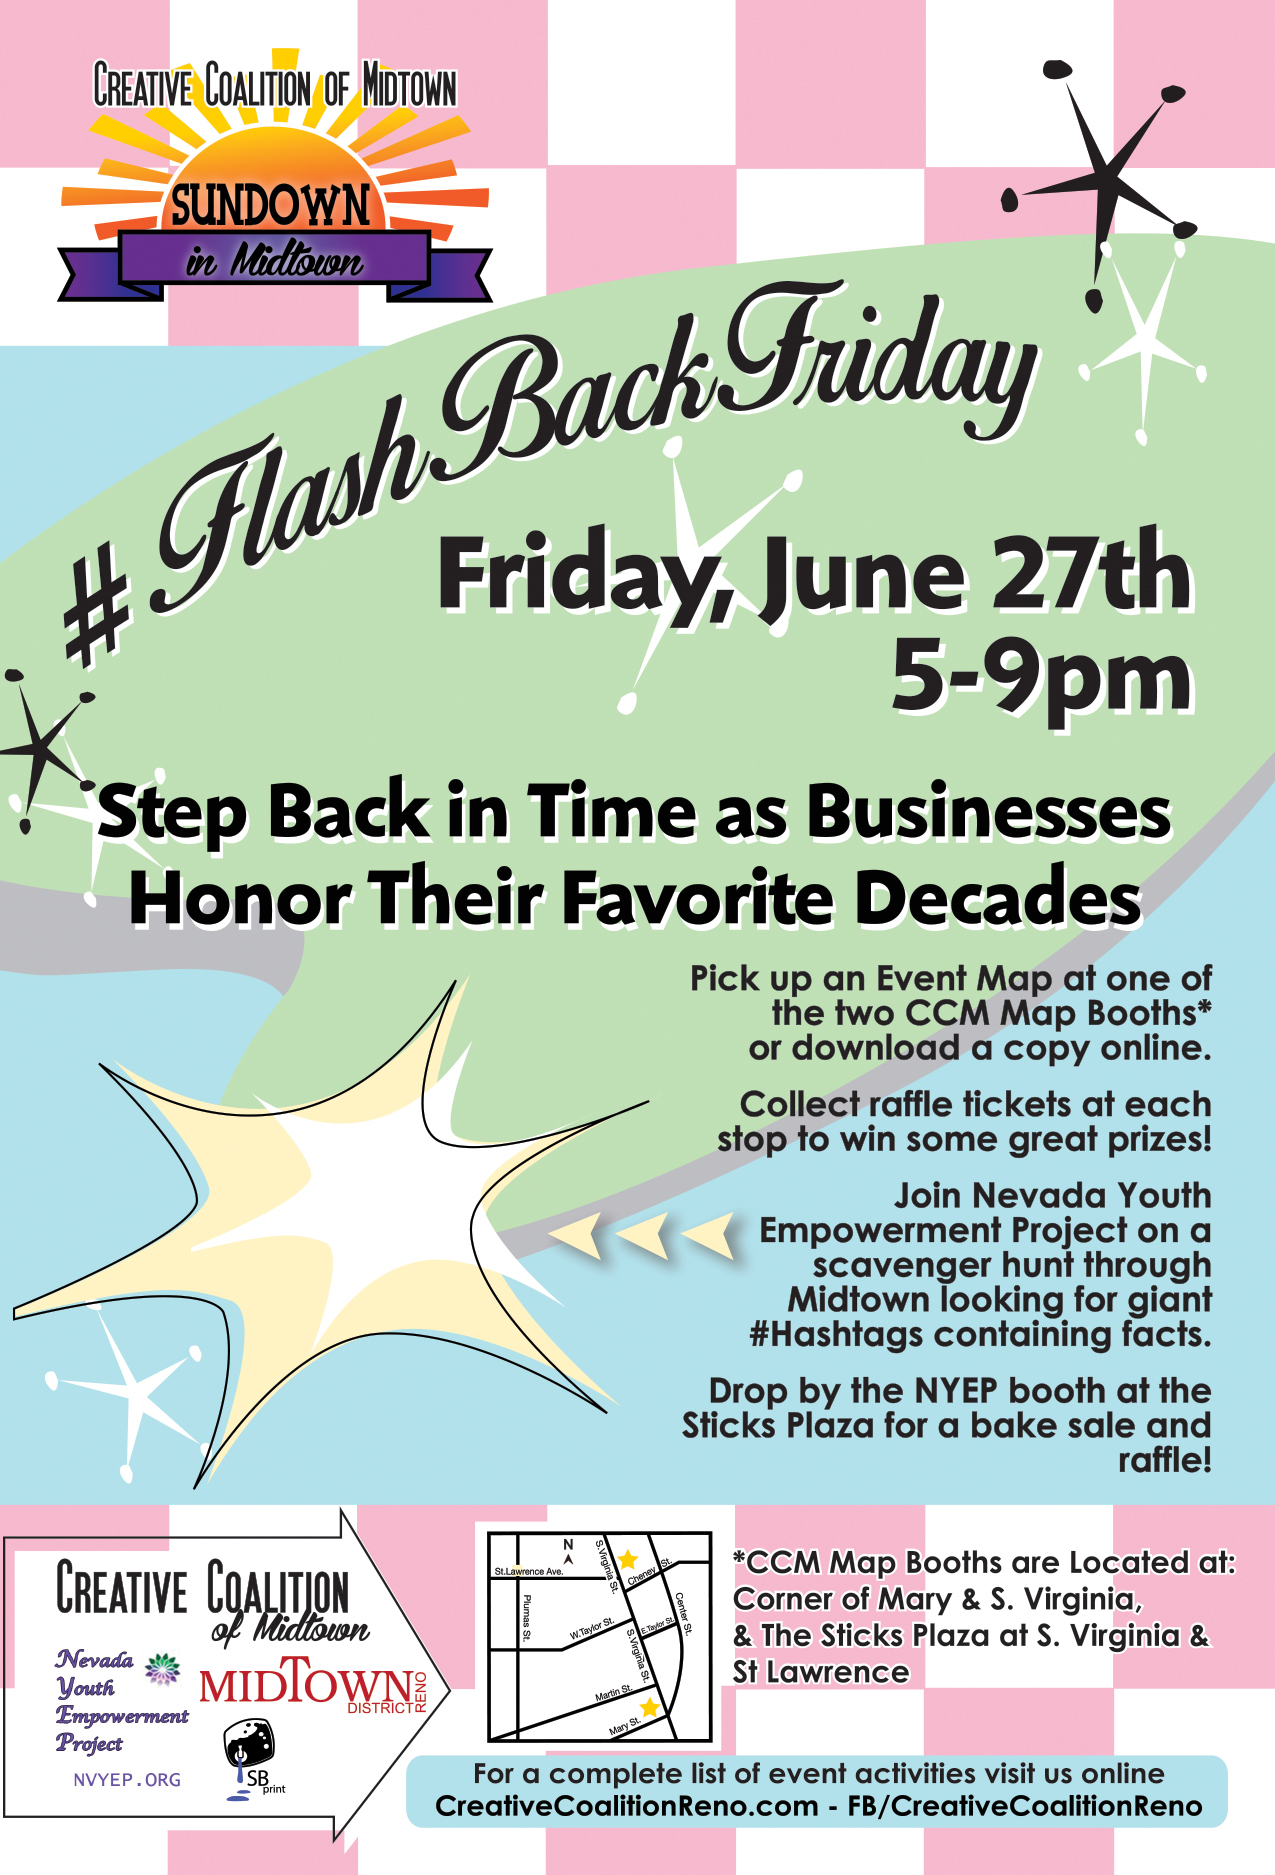 #FlashBackFriday-Flyer.jpg